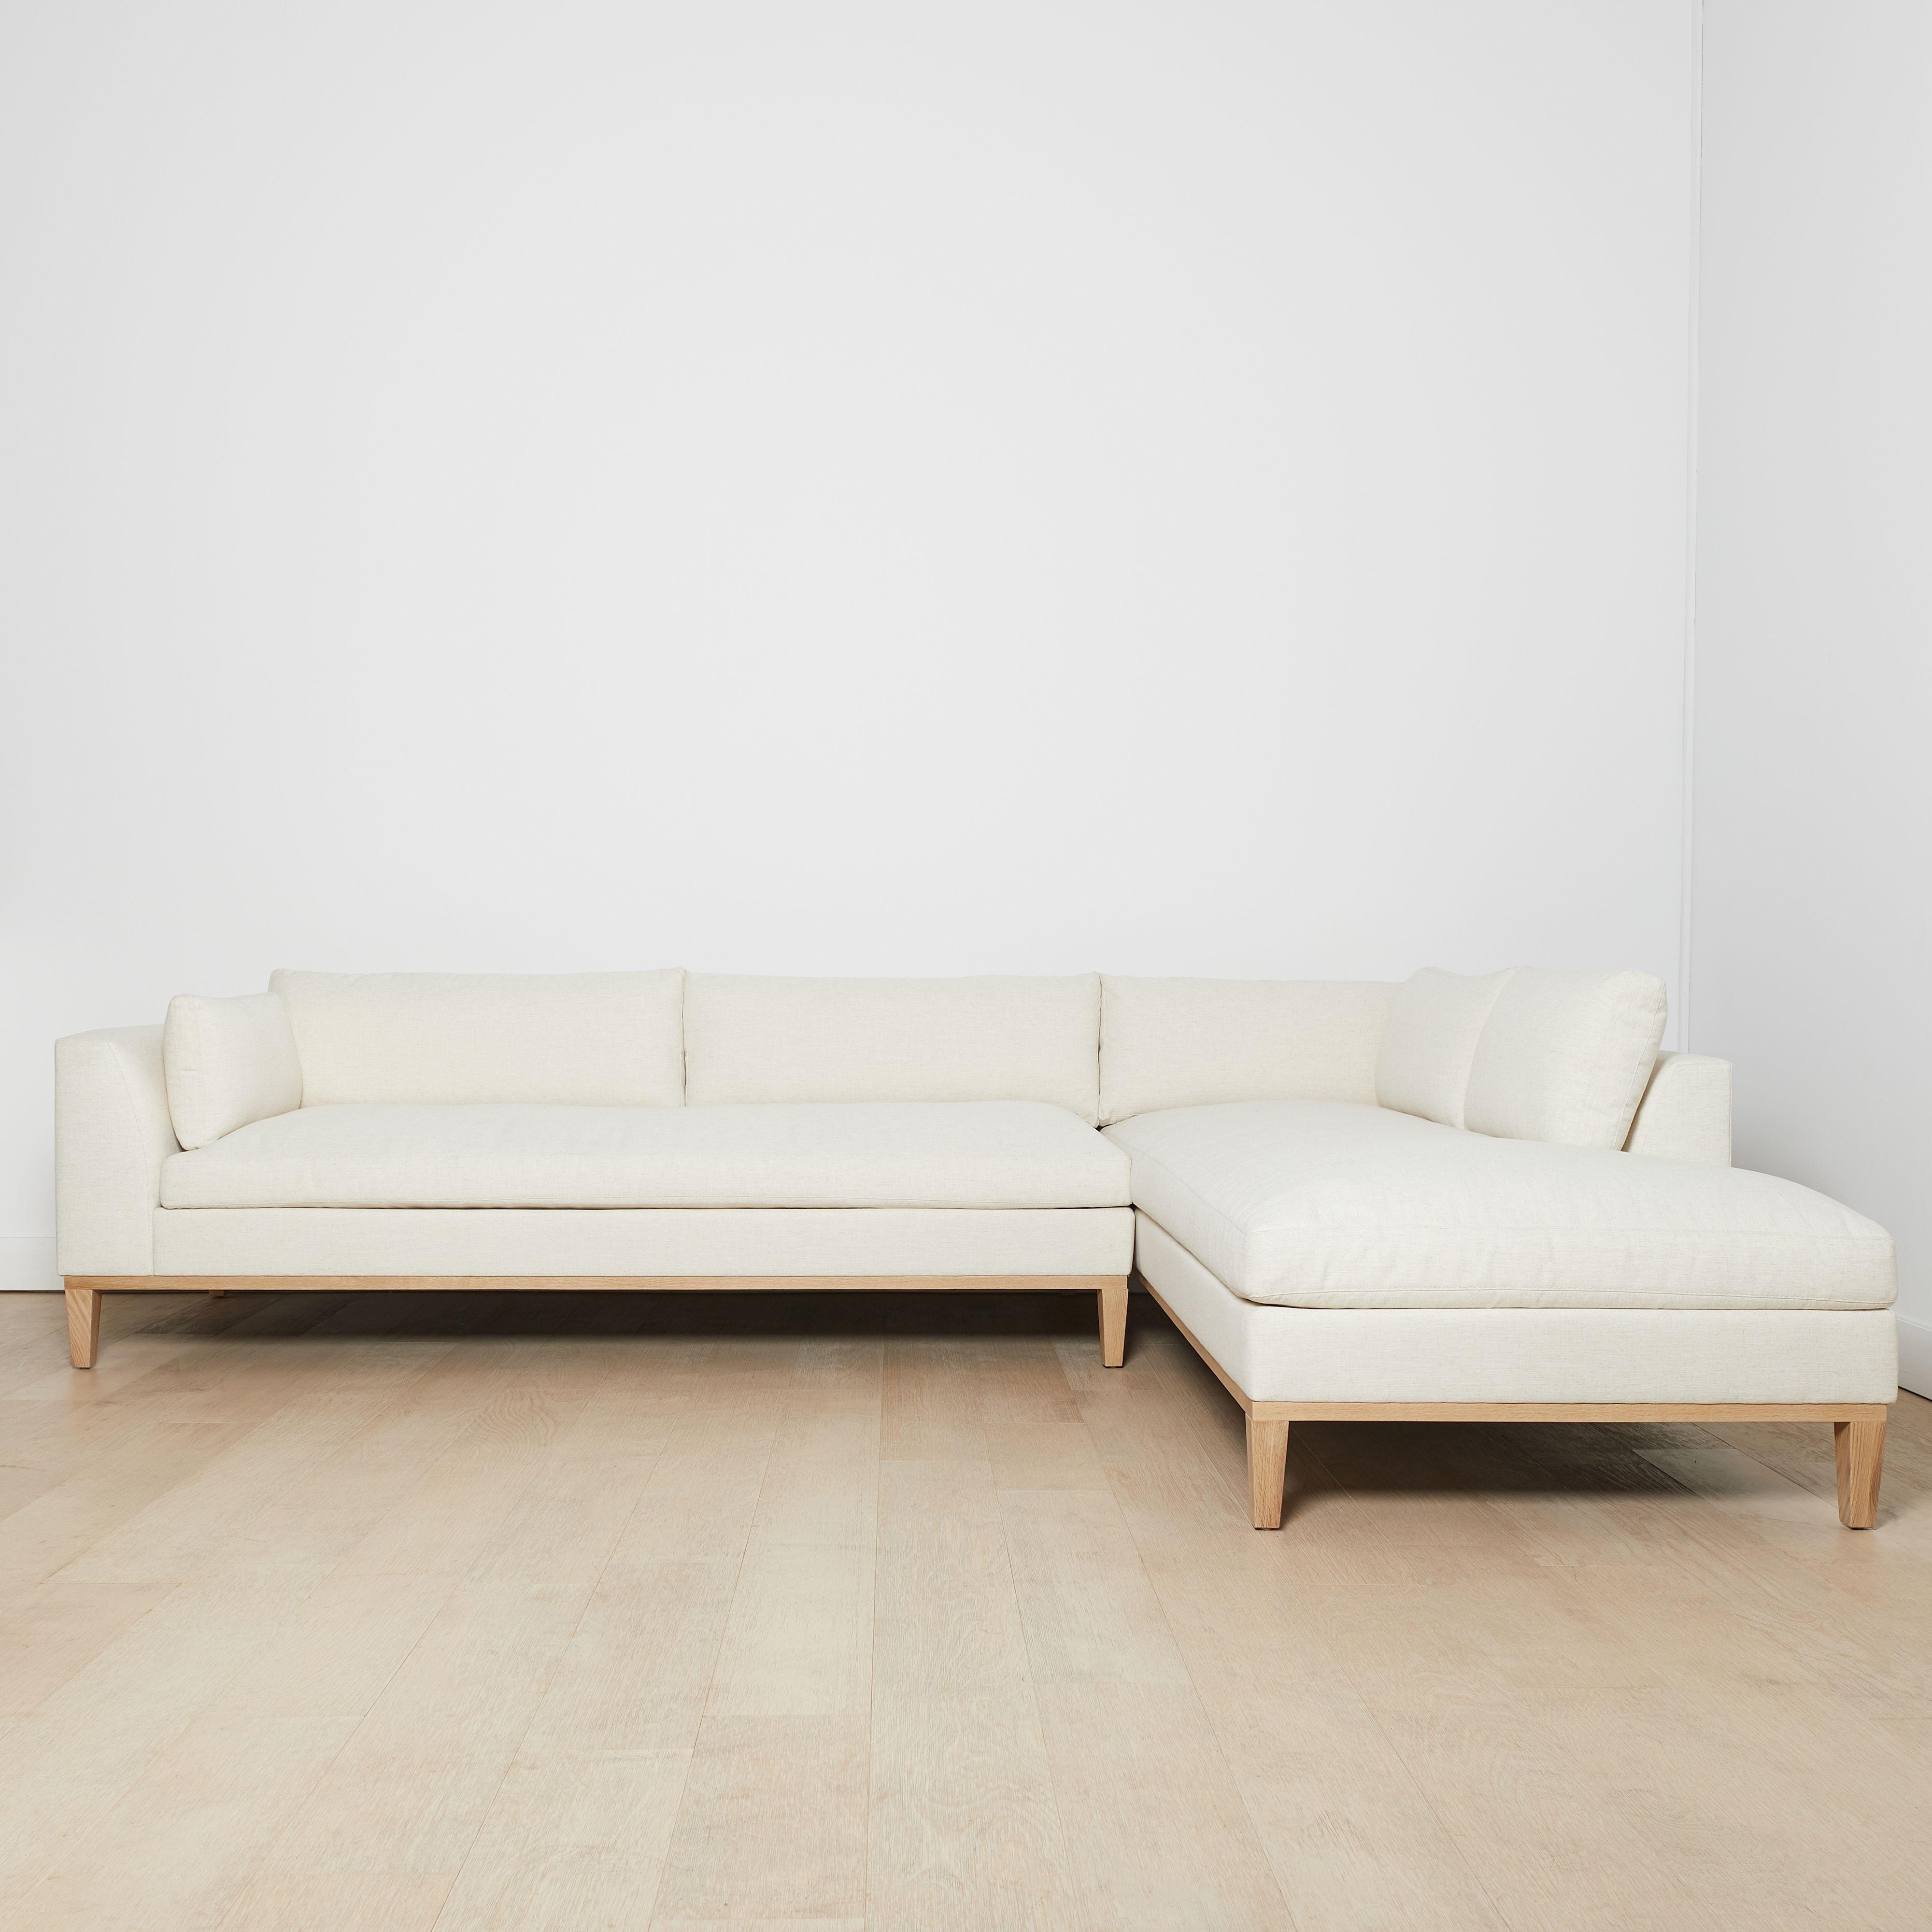 Charleston Right Facing Sectional Sofa Ivory Sectional Sectional Sofa Stylish Decor